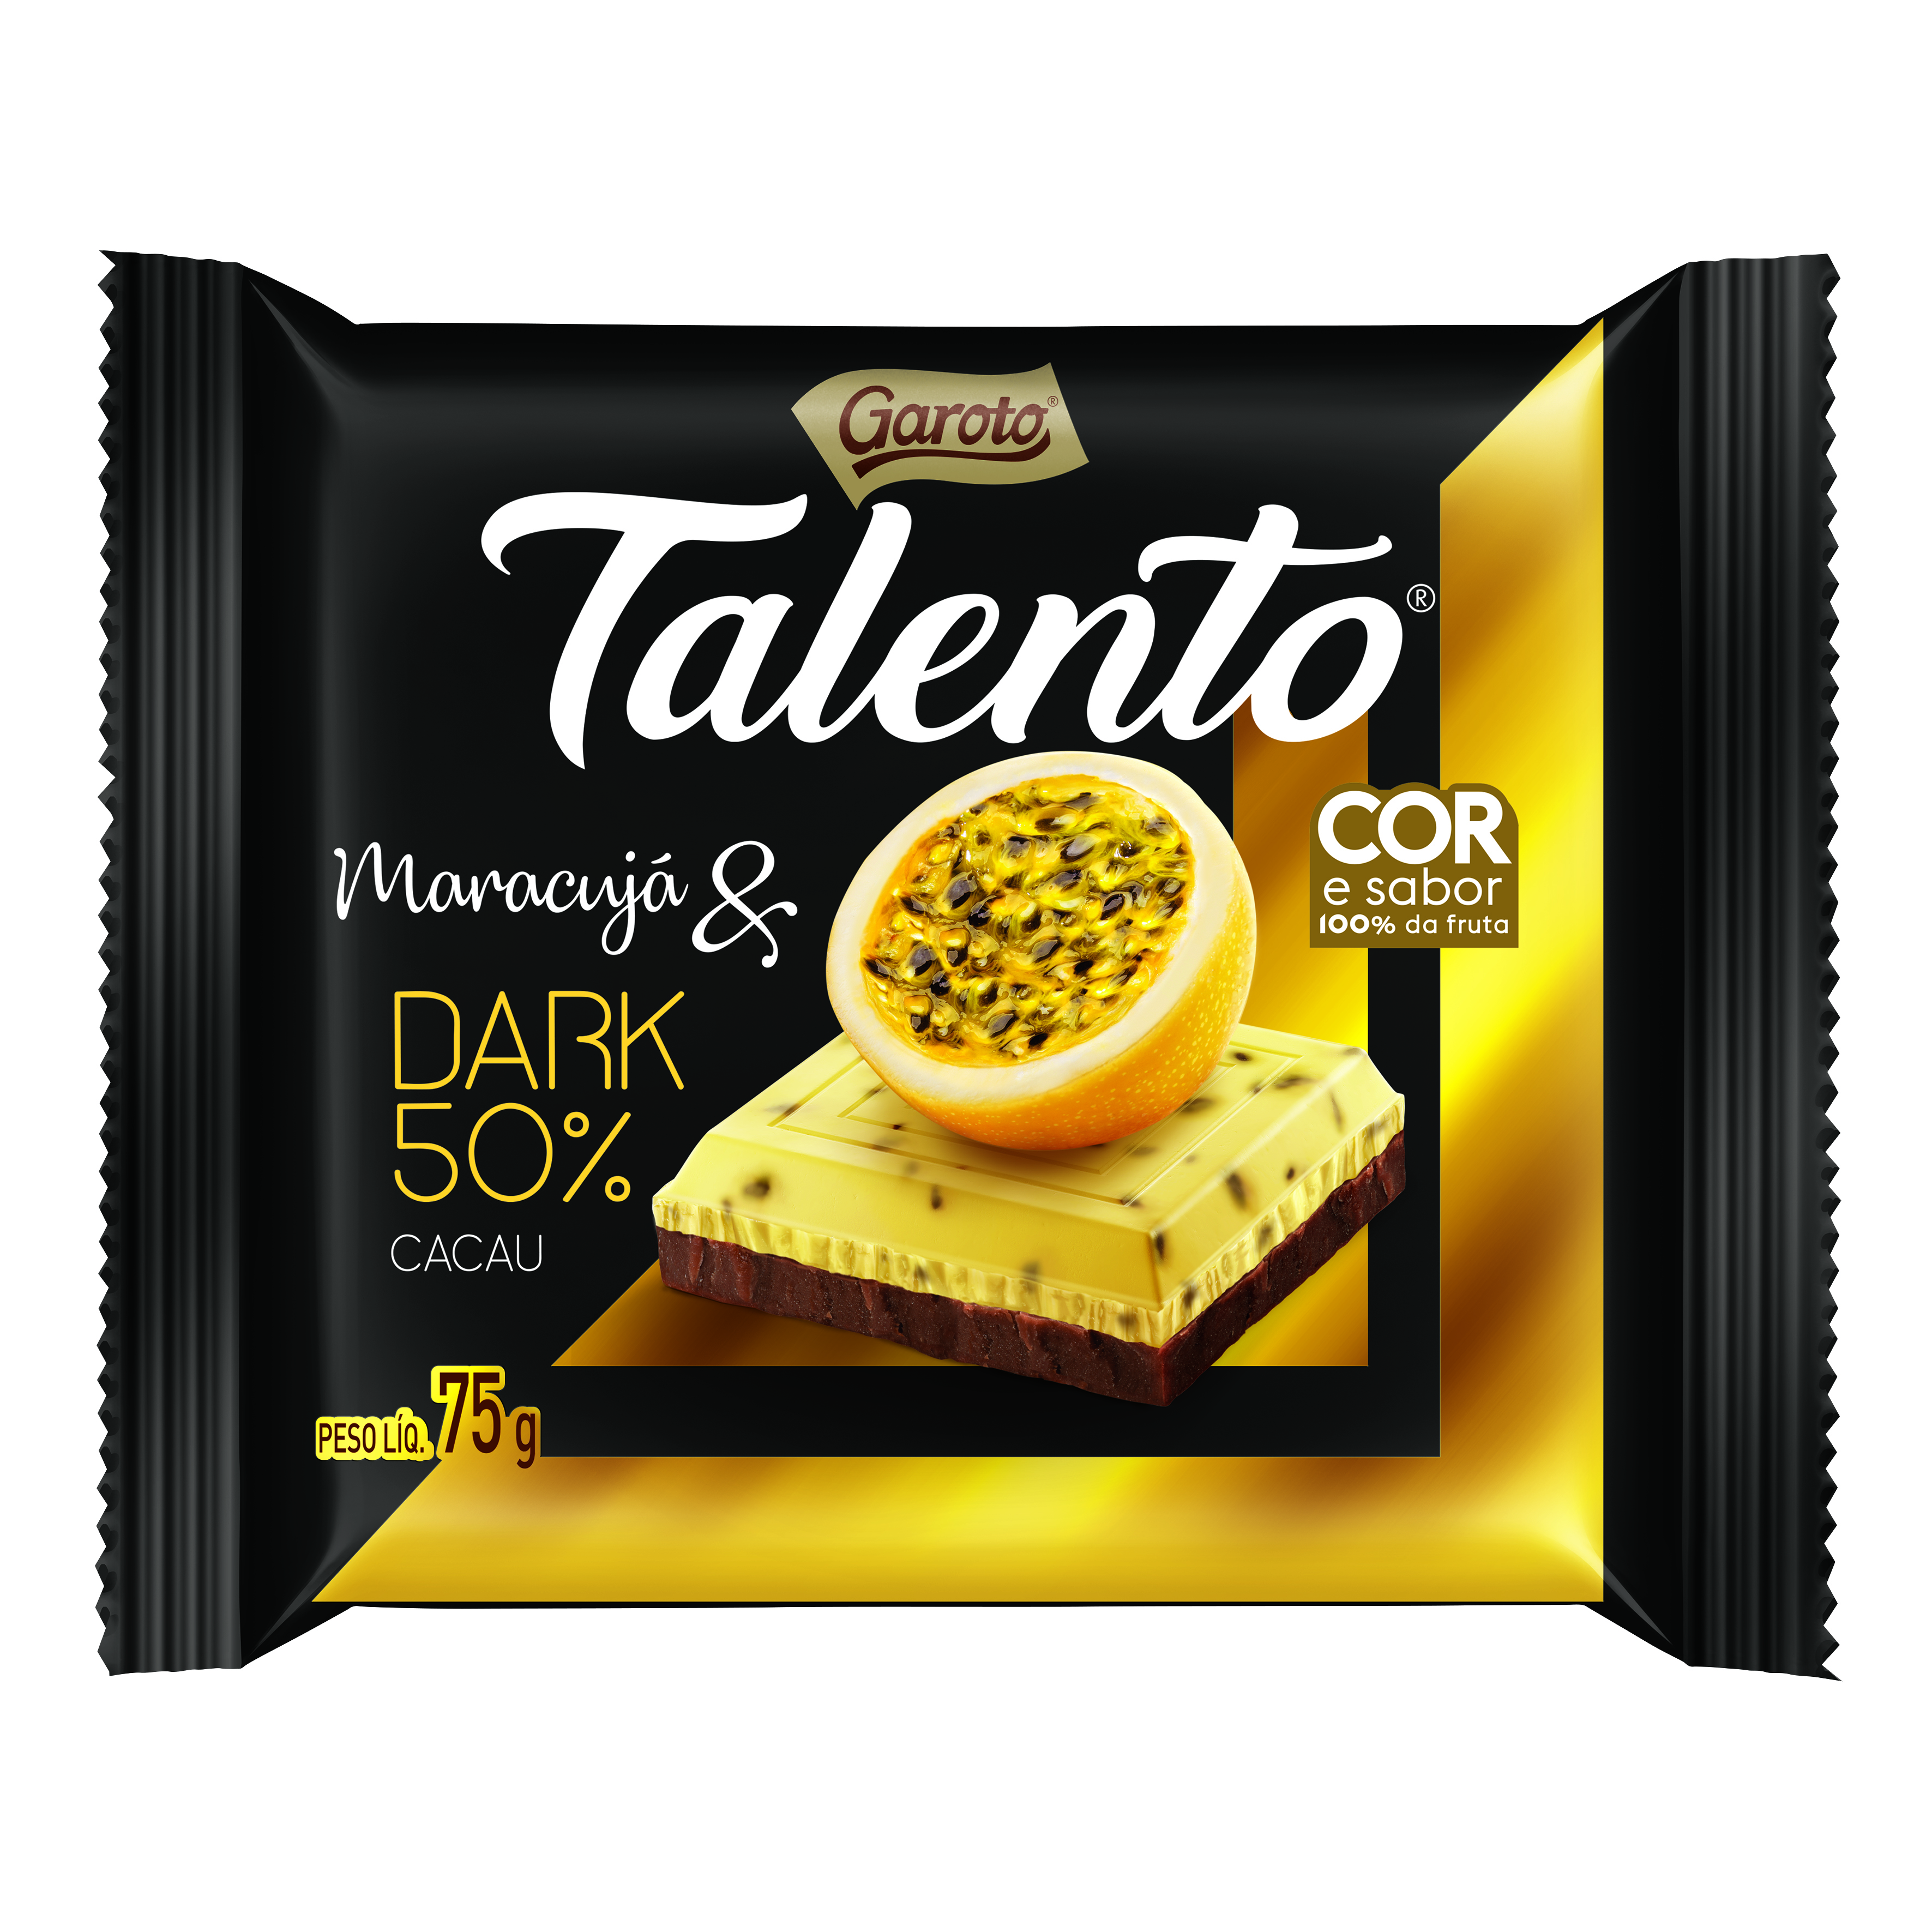 Chocolate maracujá & dark 50% cacau 75g Garoto/Talento  UN